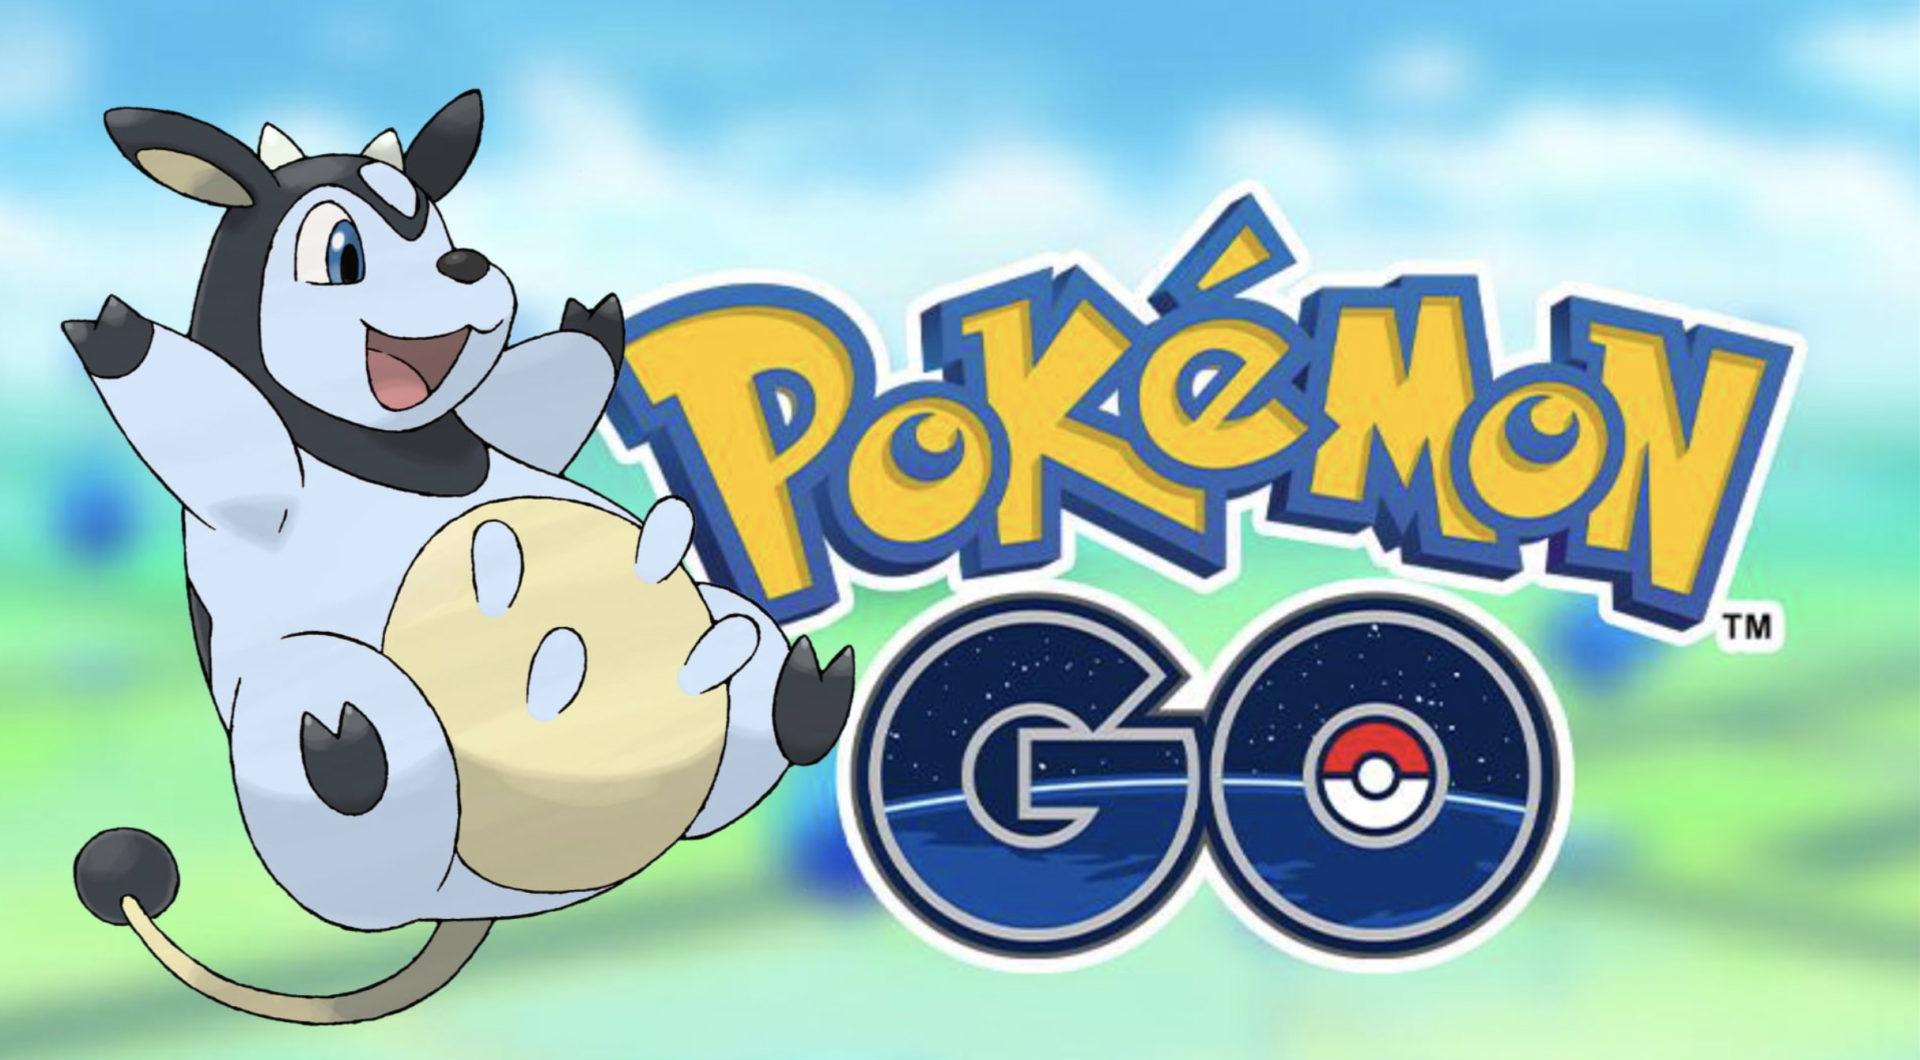 Screenshot of Shiny Miltank next to Pokemon Go logo.